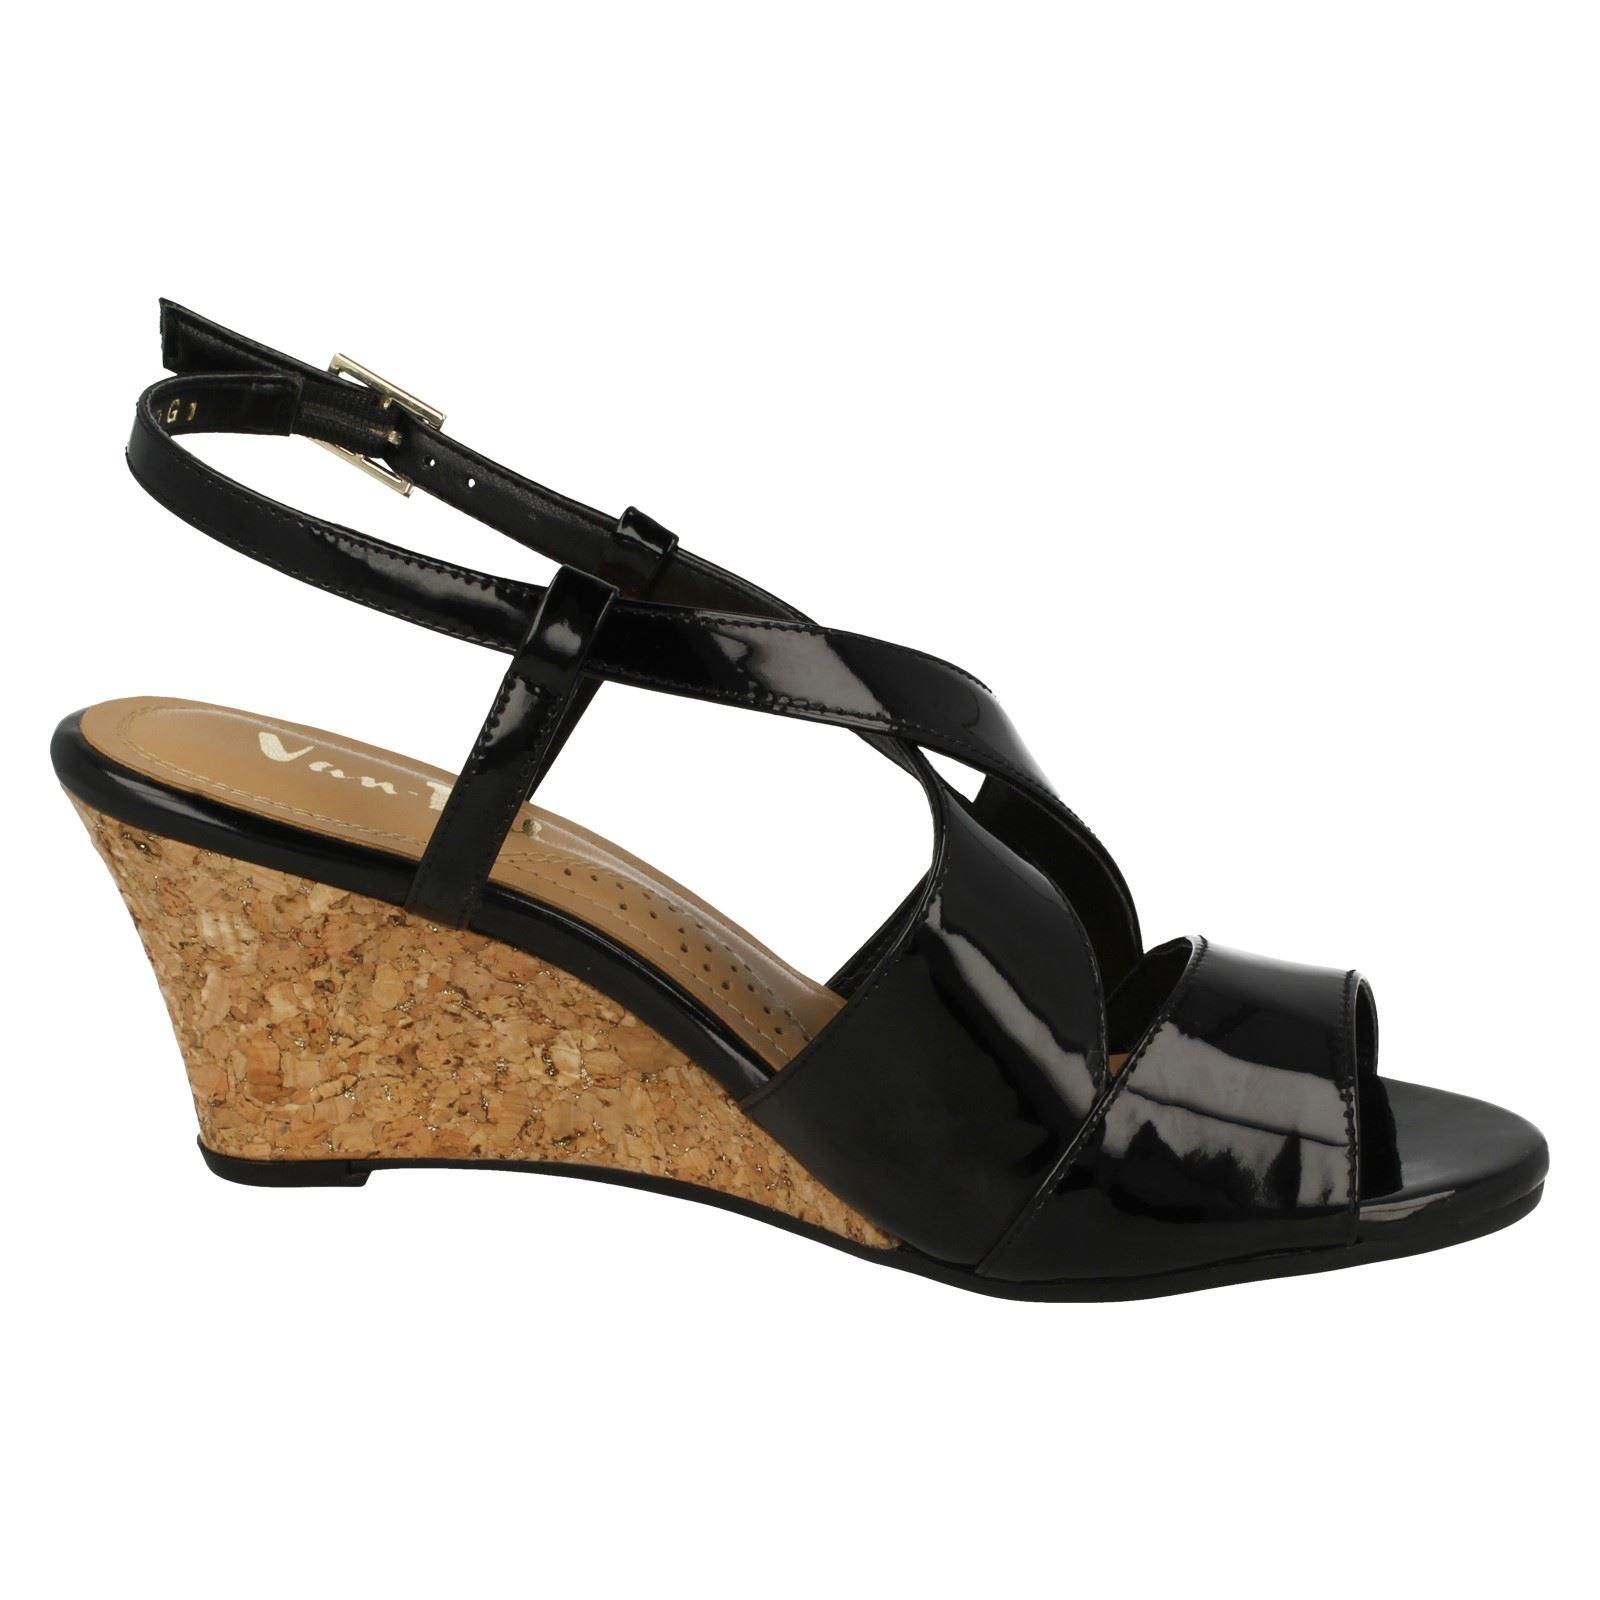 Ladies-Van-Dal-Cross-Strap-Wedged-Sandal-Allora thumbnail 15